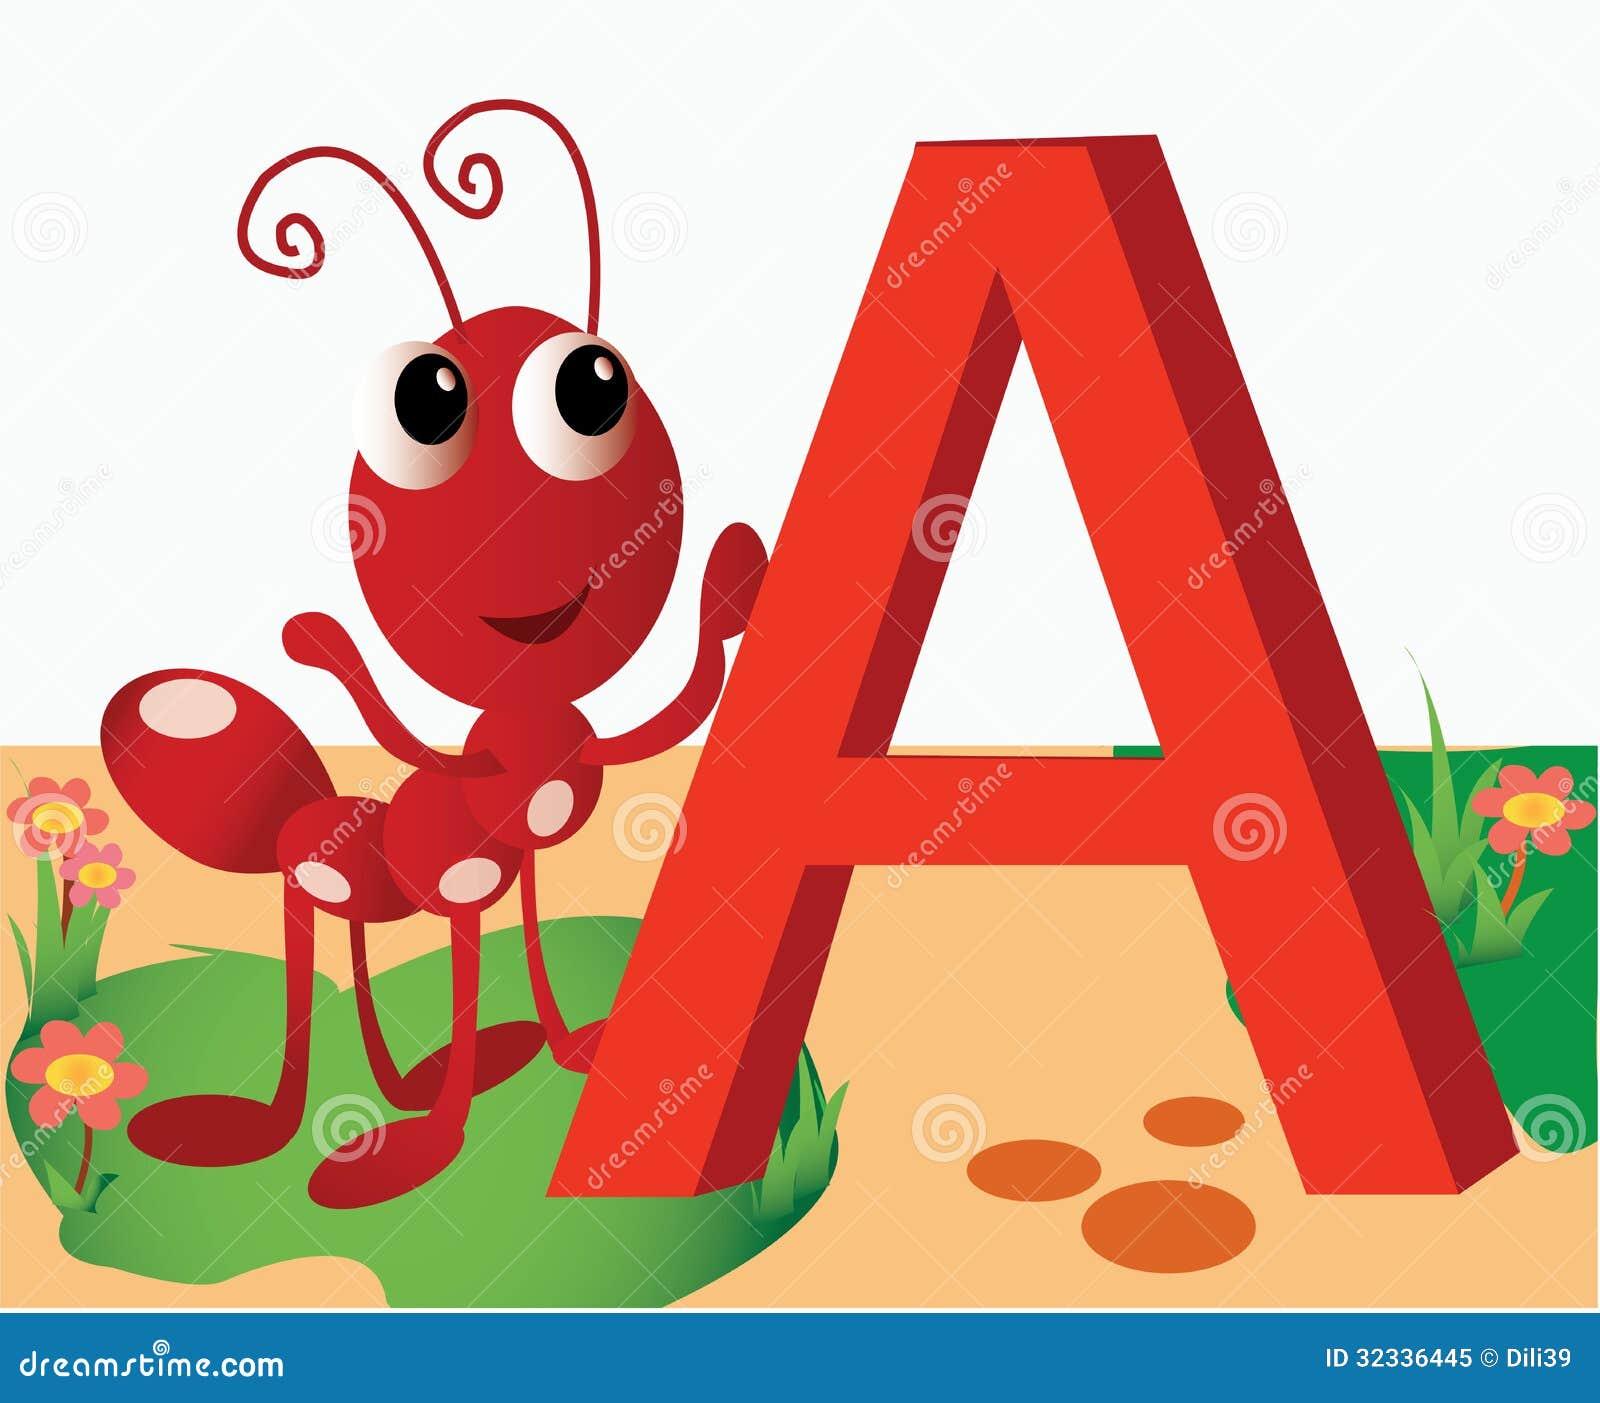 A Alphabet Images Animal alphabet A stoc...